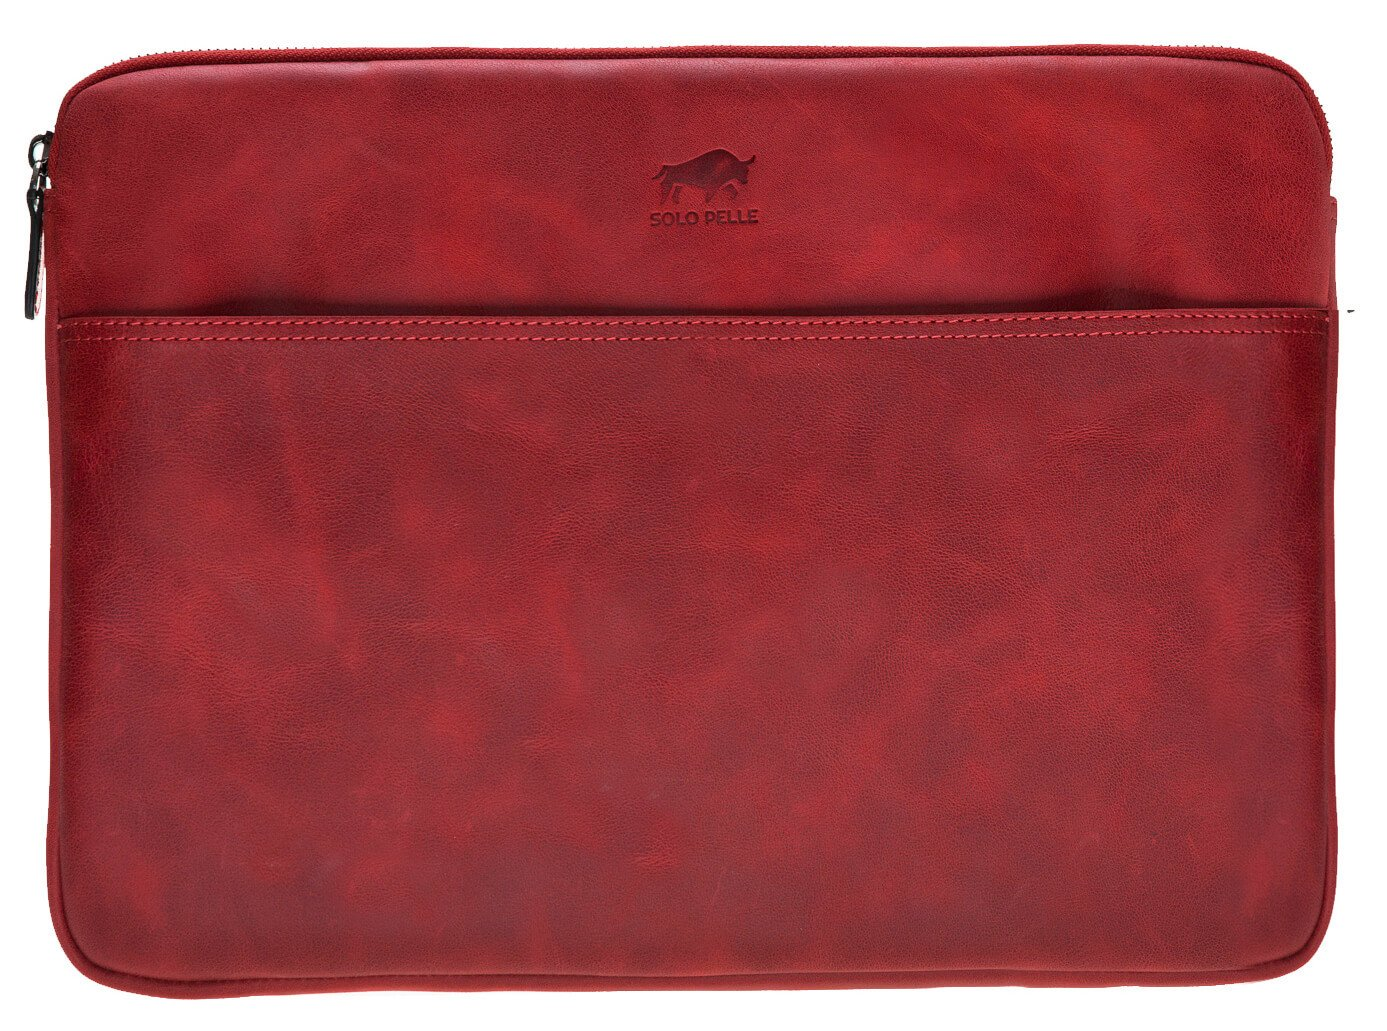 Ledertasche für das Apple MacBook Pro 15/16 Zoll Lederhülle Case Hülle Awenta Tasche aus echtem Leder Rot Burned